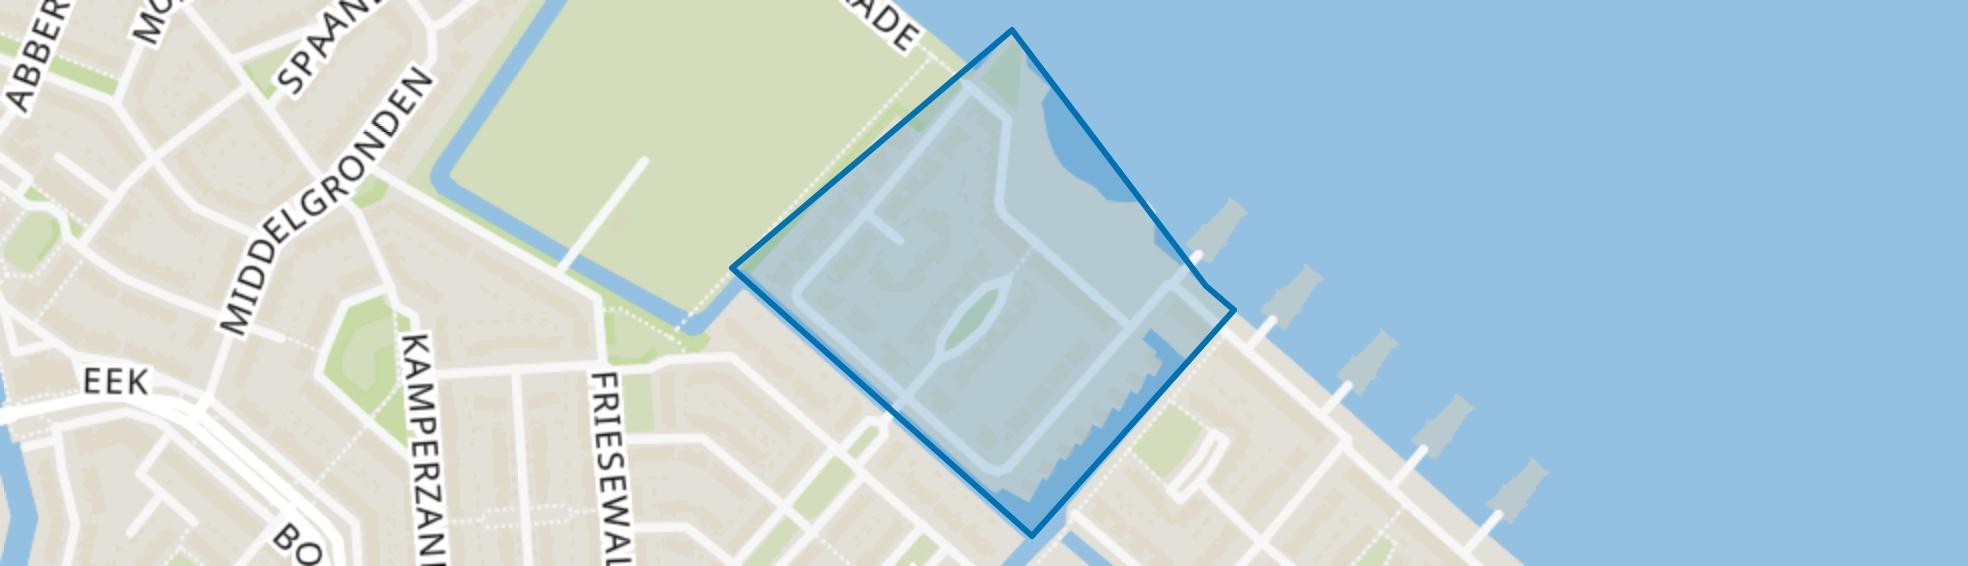 De Tuit, Huizen map